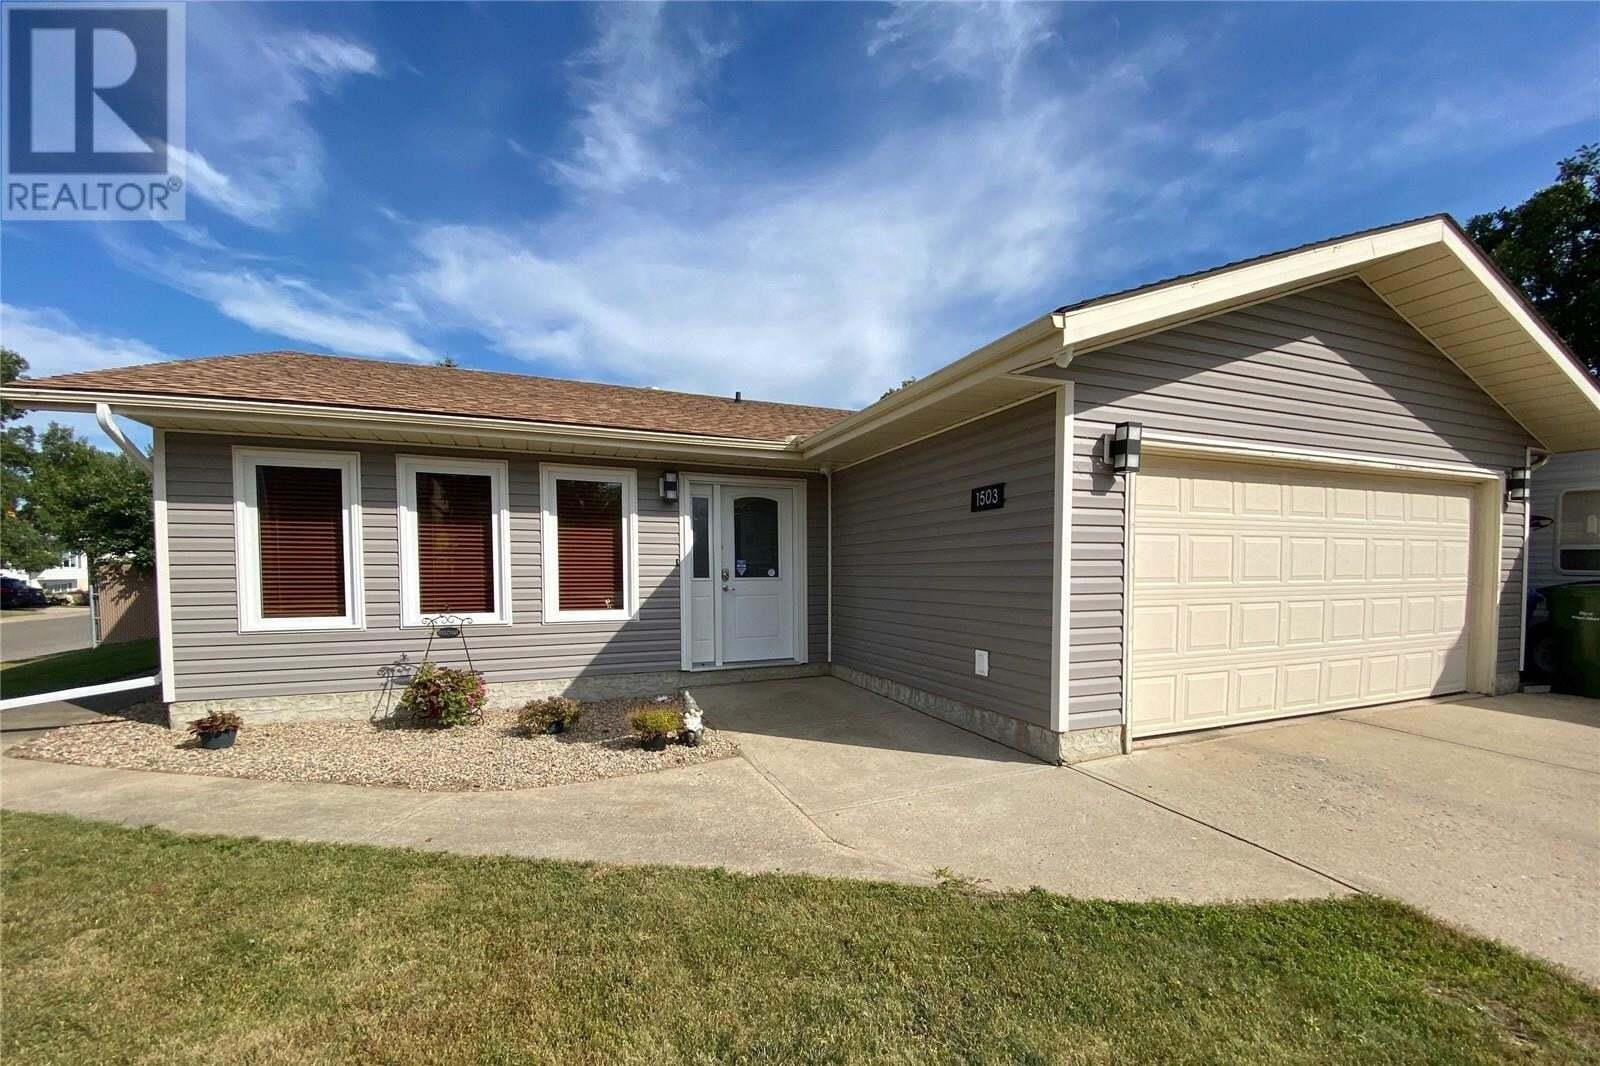 House for sale at 1503 Bliss Cres Prince Albert Saskatchewan - MLS: SK822028